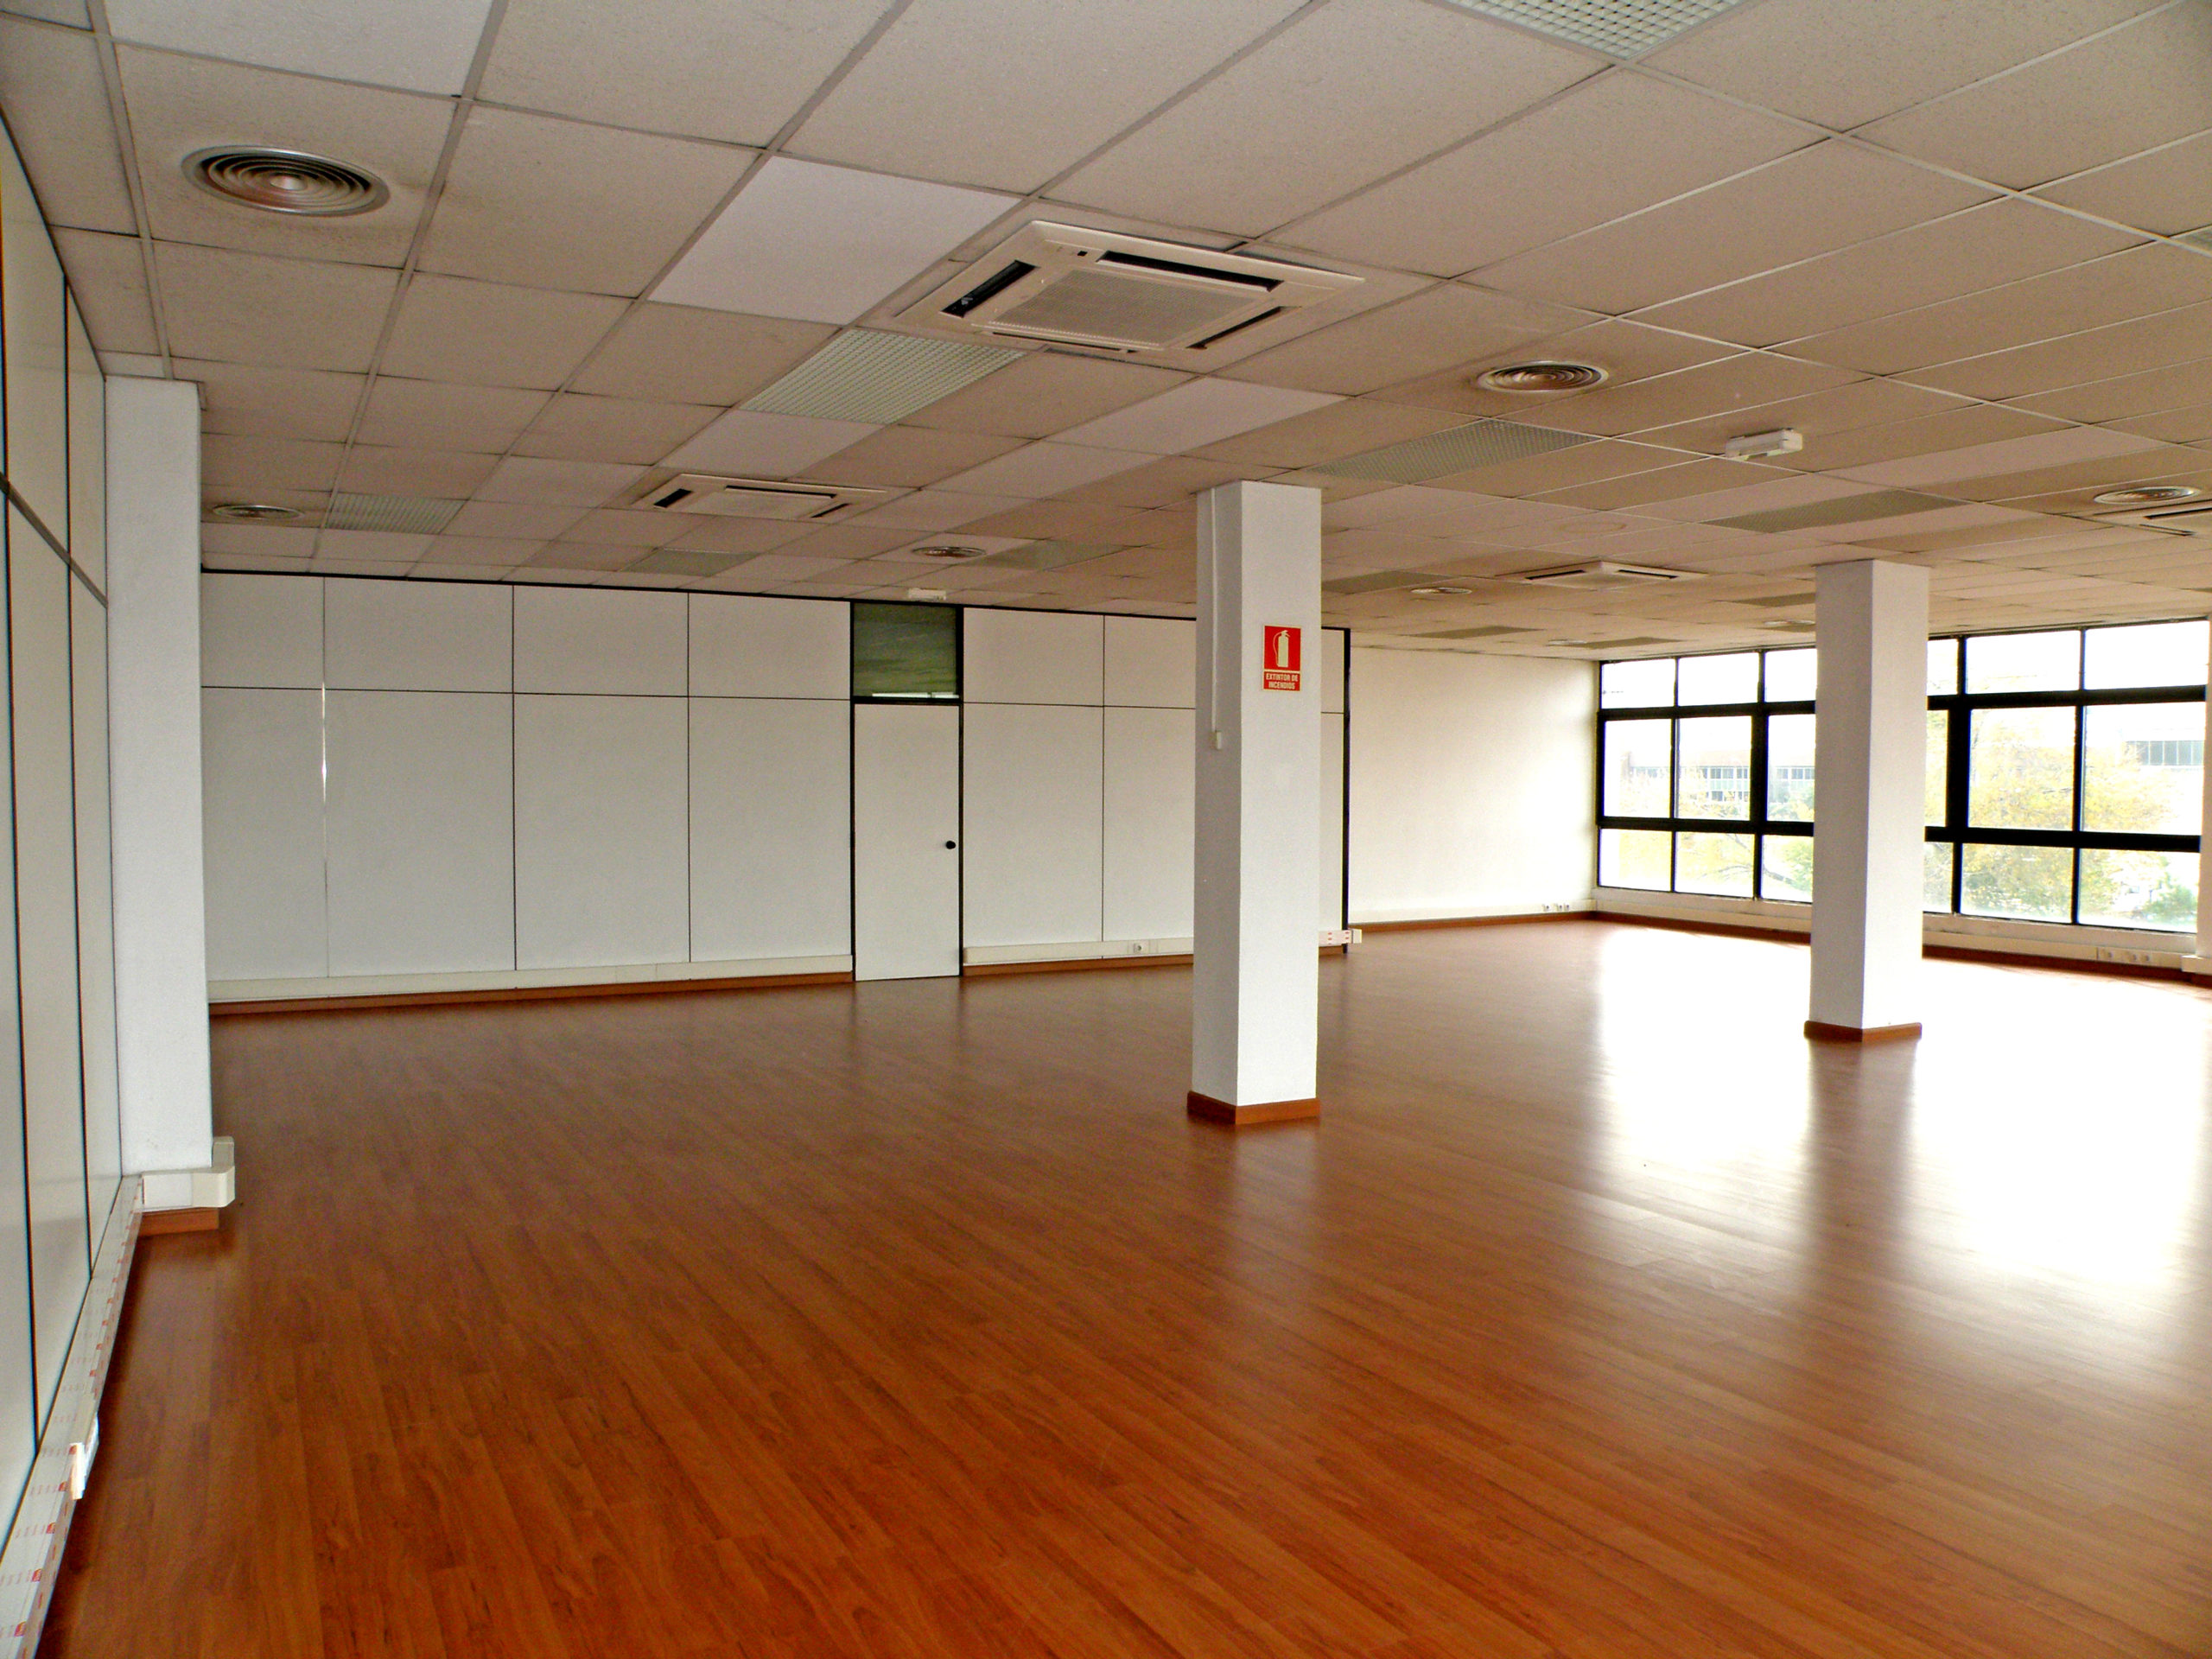 Oficina representativa 240 metros